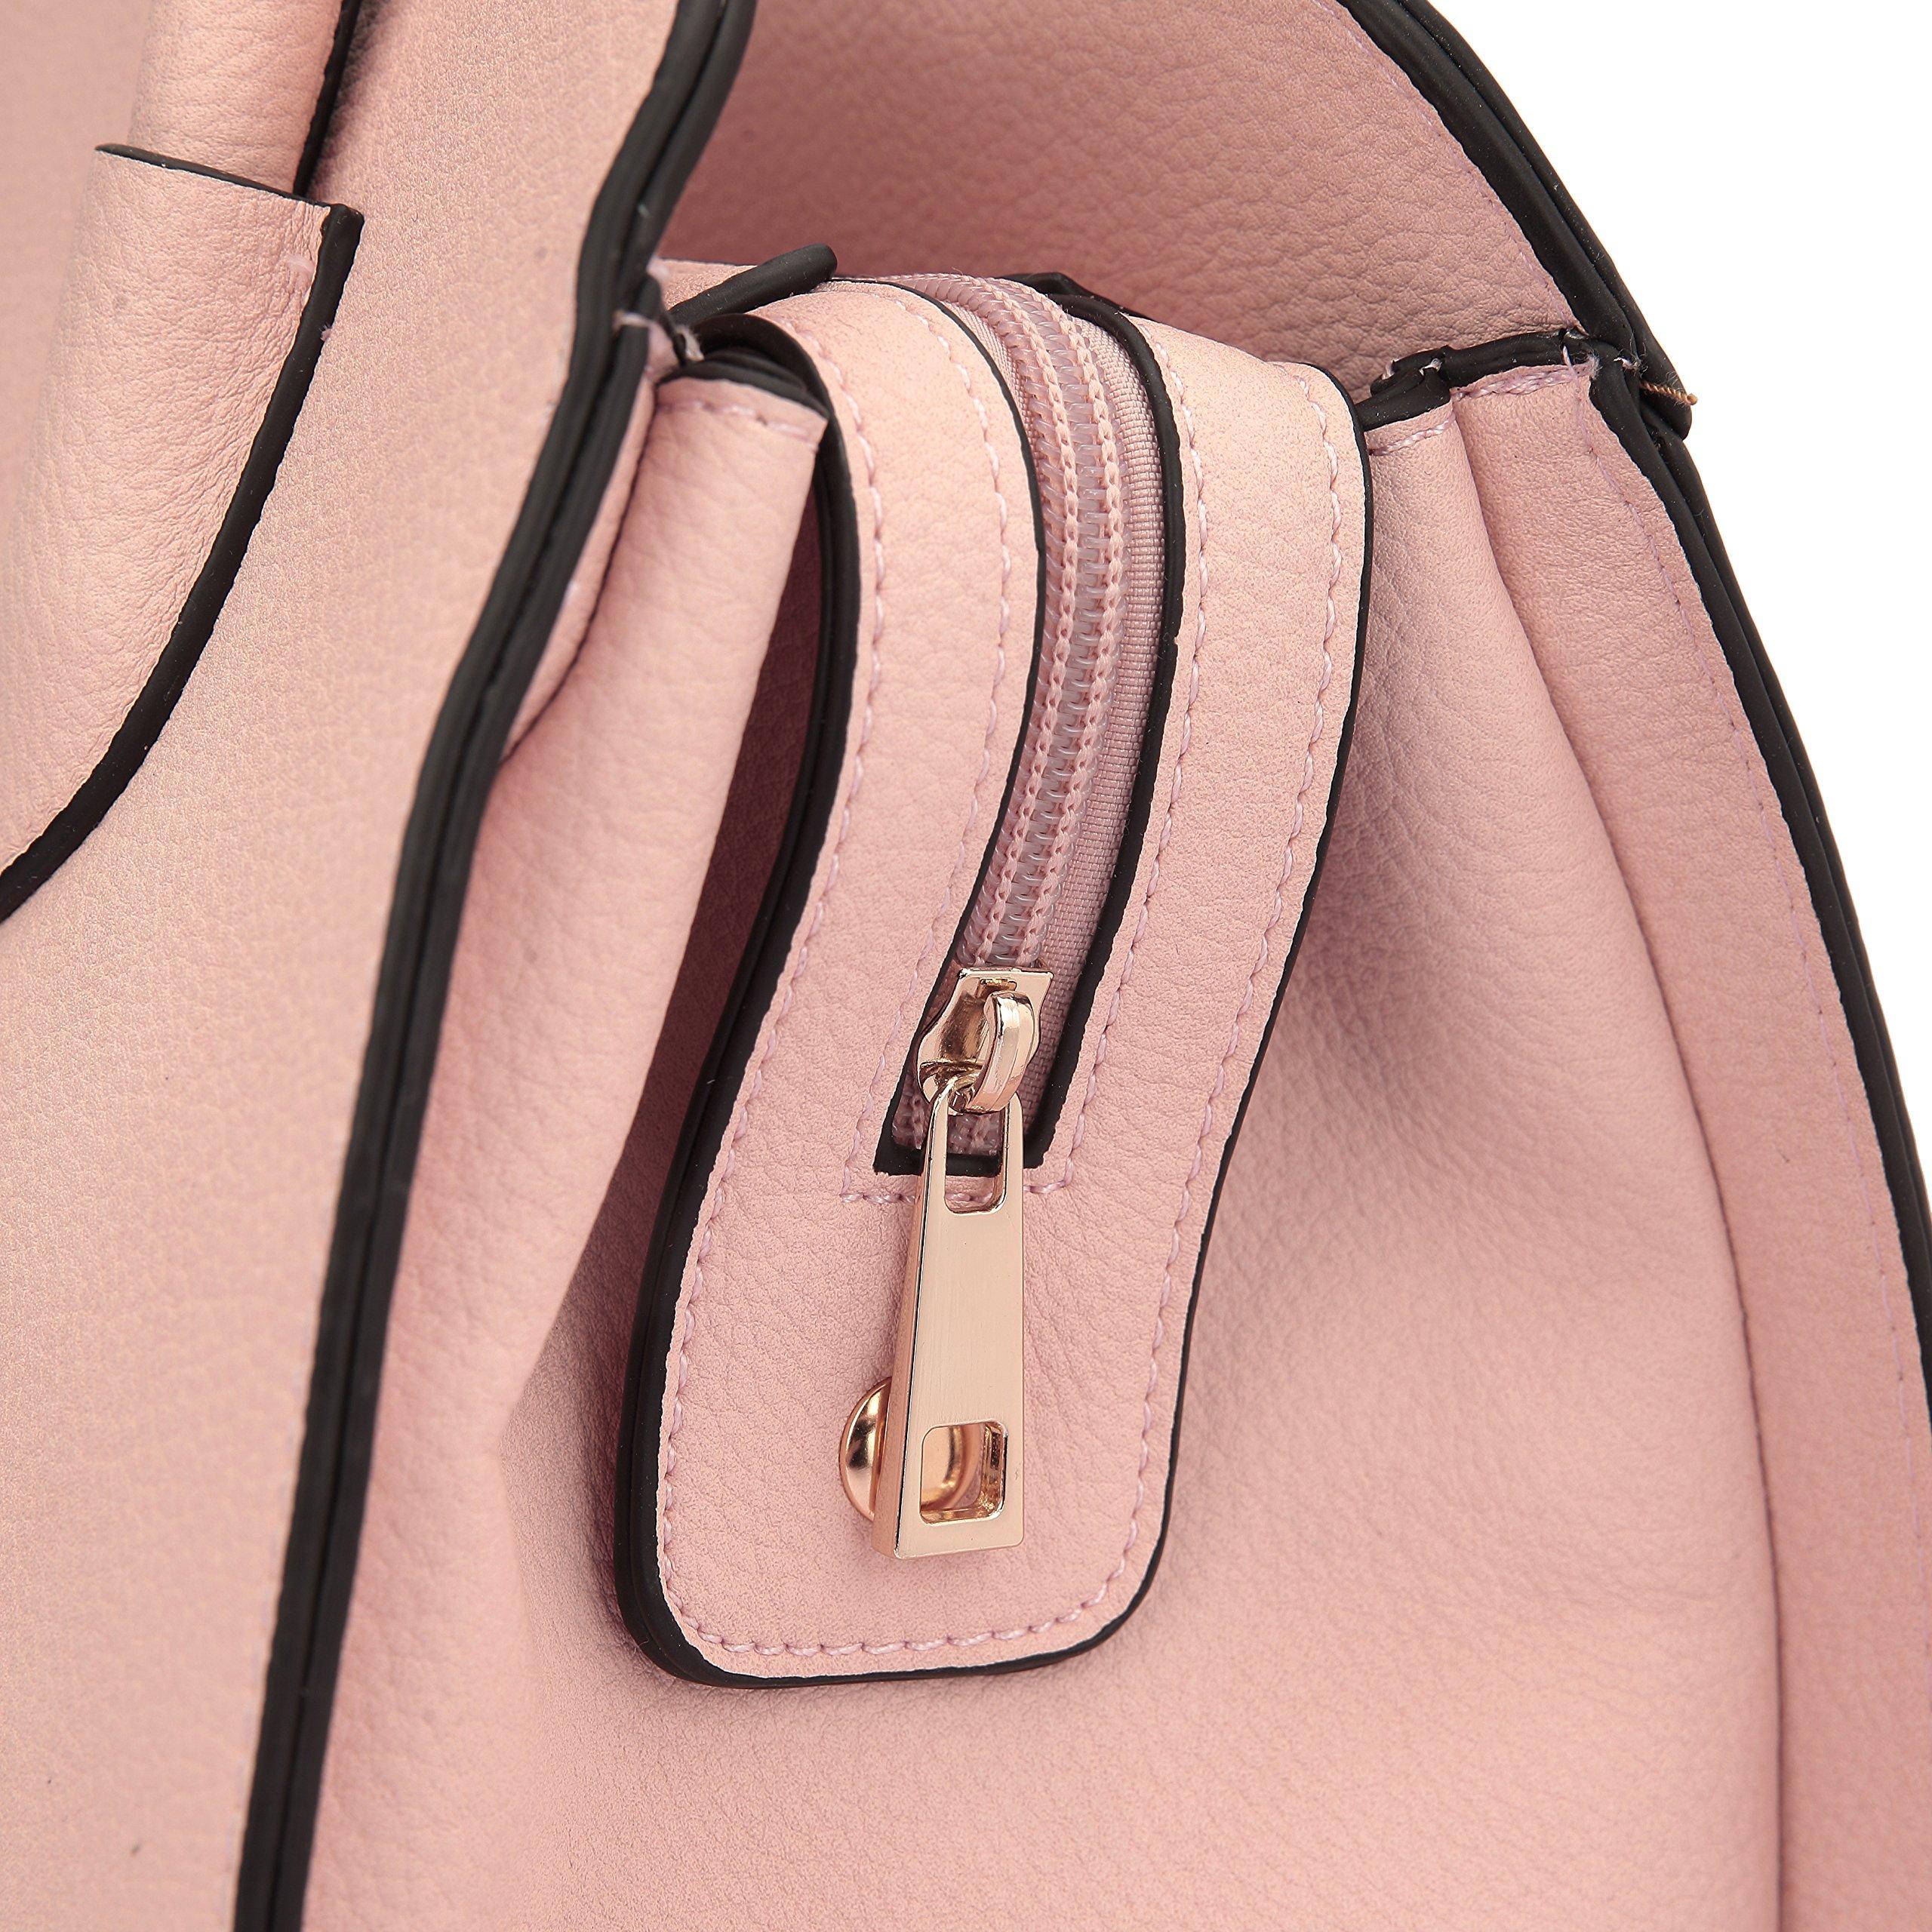 Women Structured Satchel Bags Vegan Leather Handbag Top Handle Purse Fashion Shoulder Bag with Fringed Tassel by Dasein (Image #7)